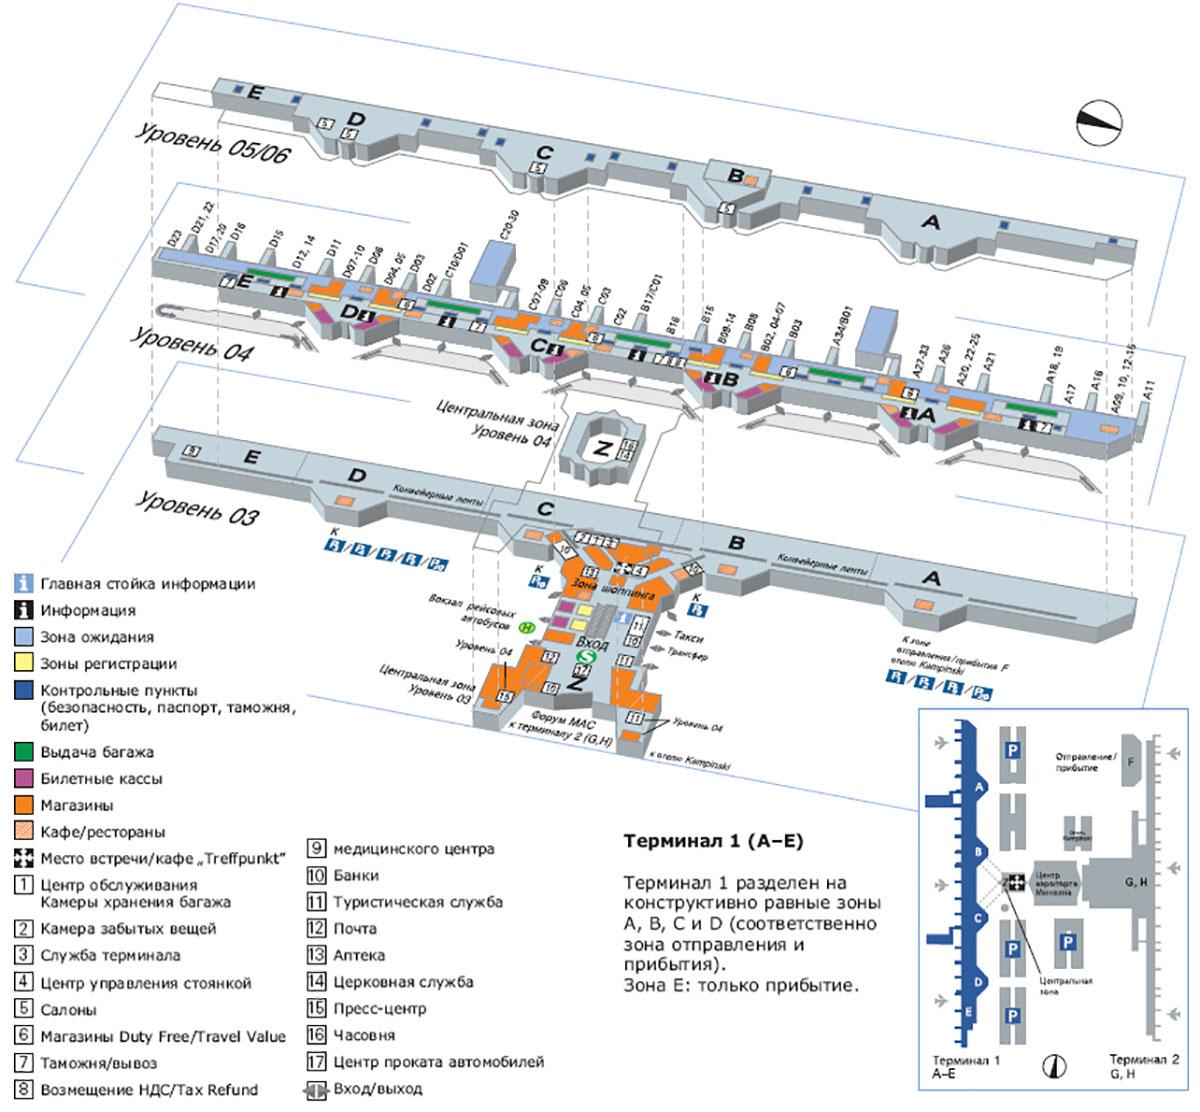 аэропорт Мюнхена терминал 1 схема